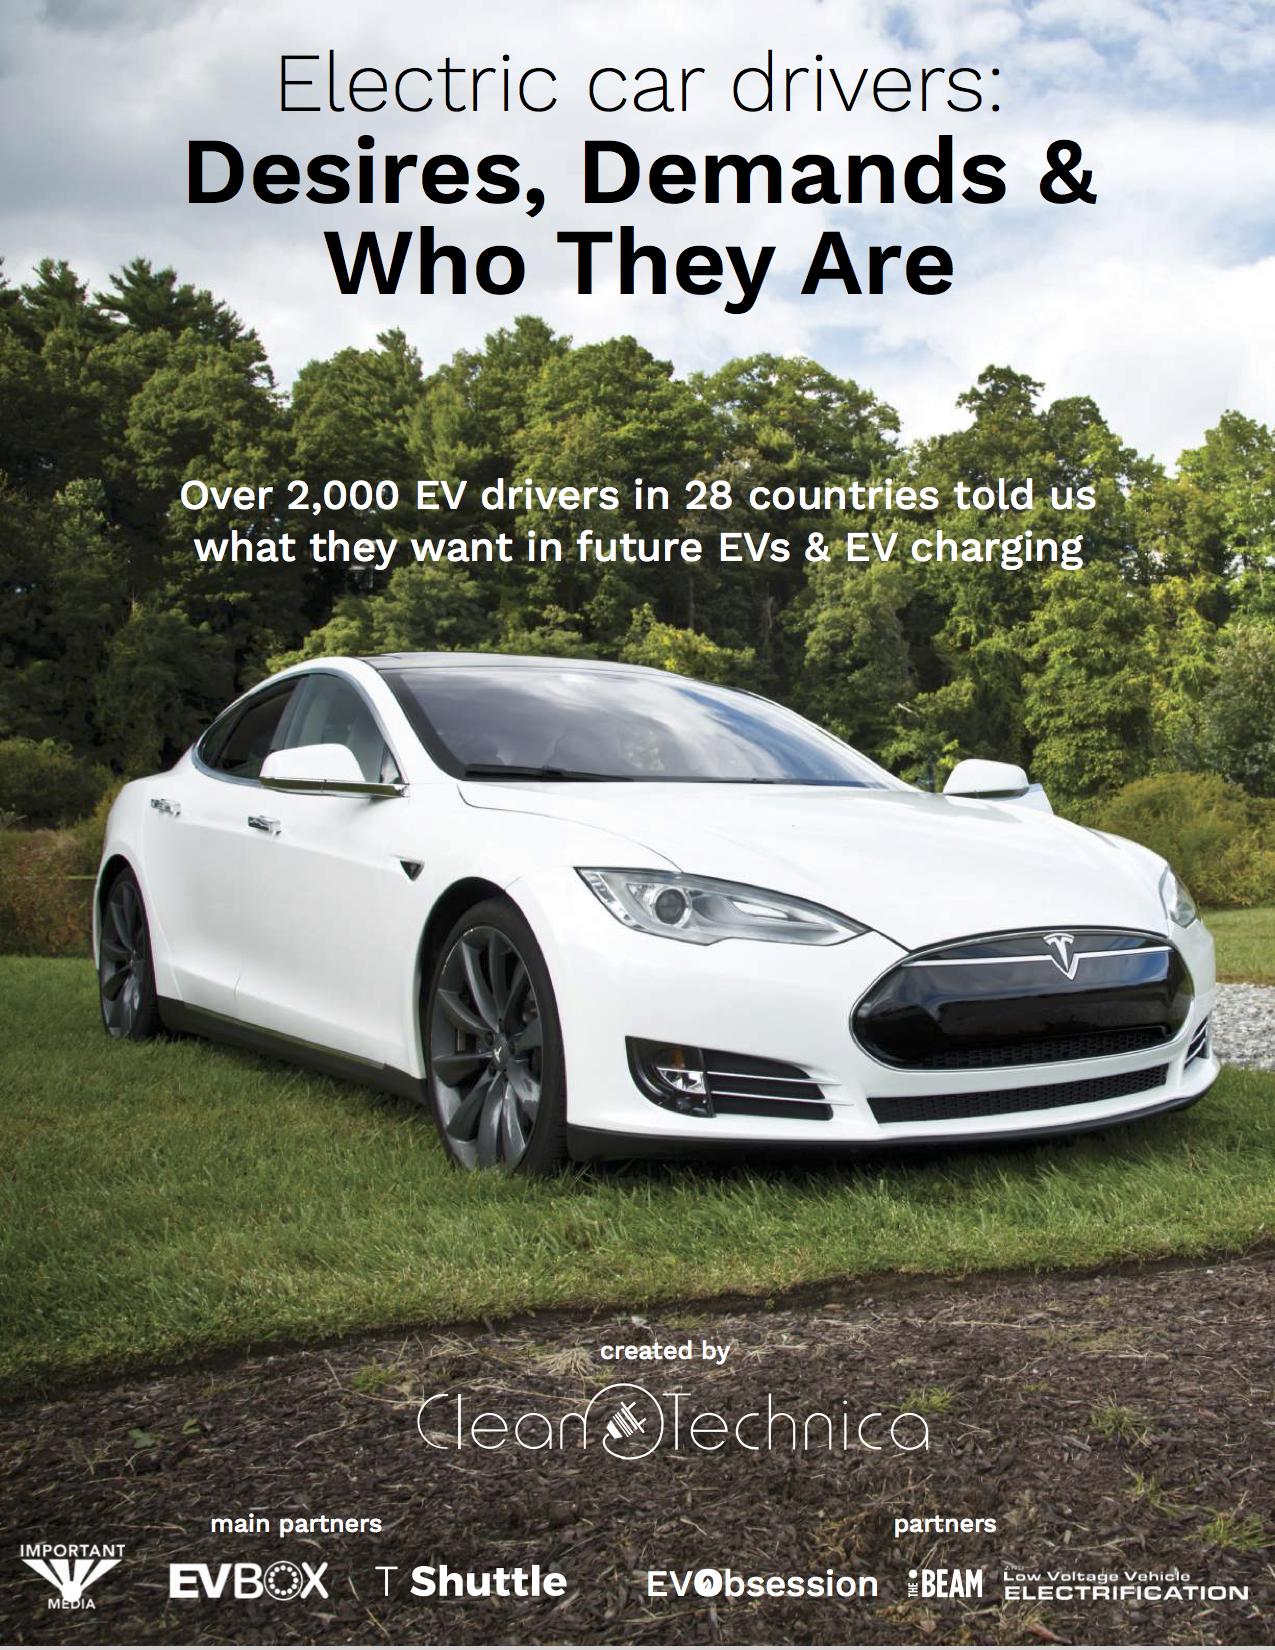 Drawn vehicle car pollution Our Good EV New Environment